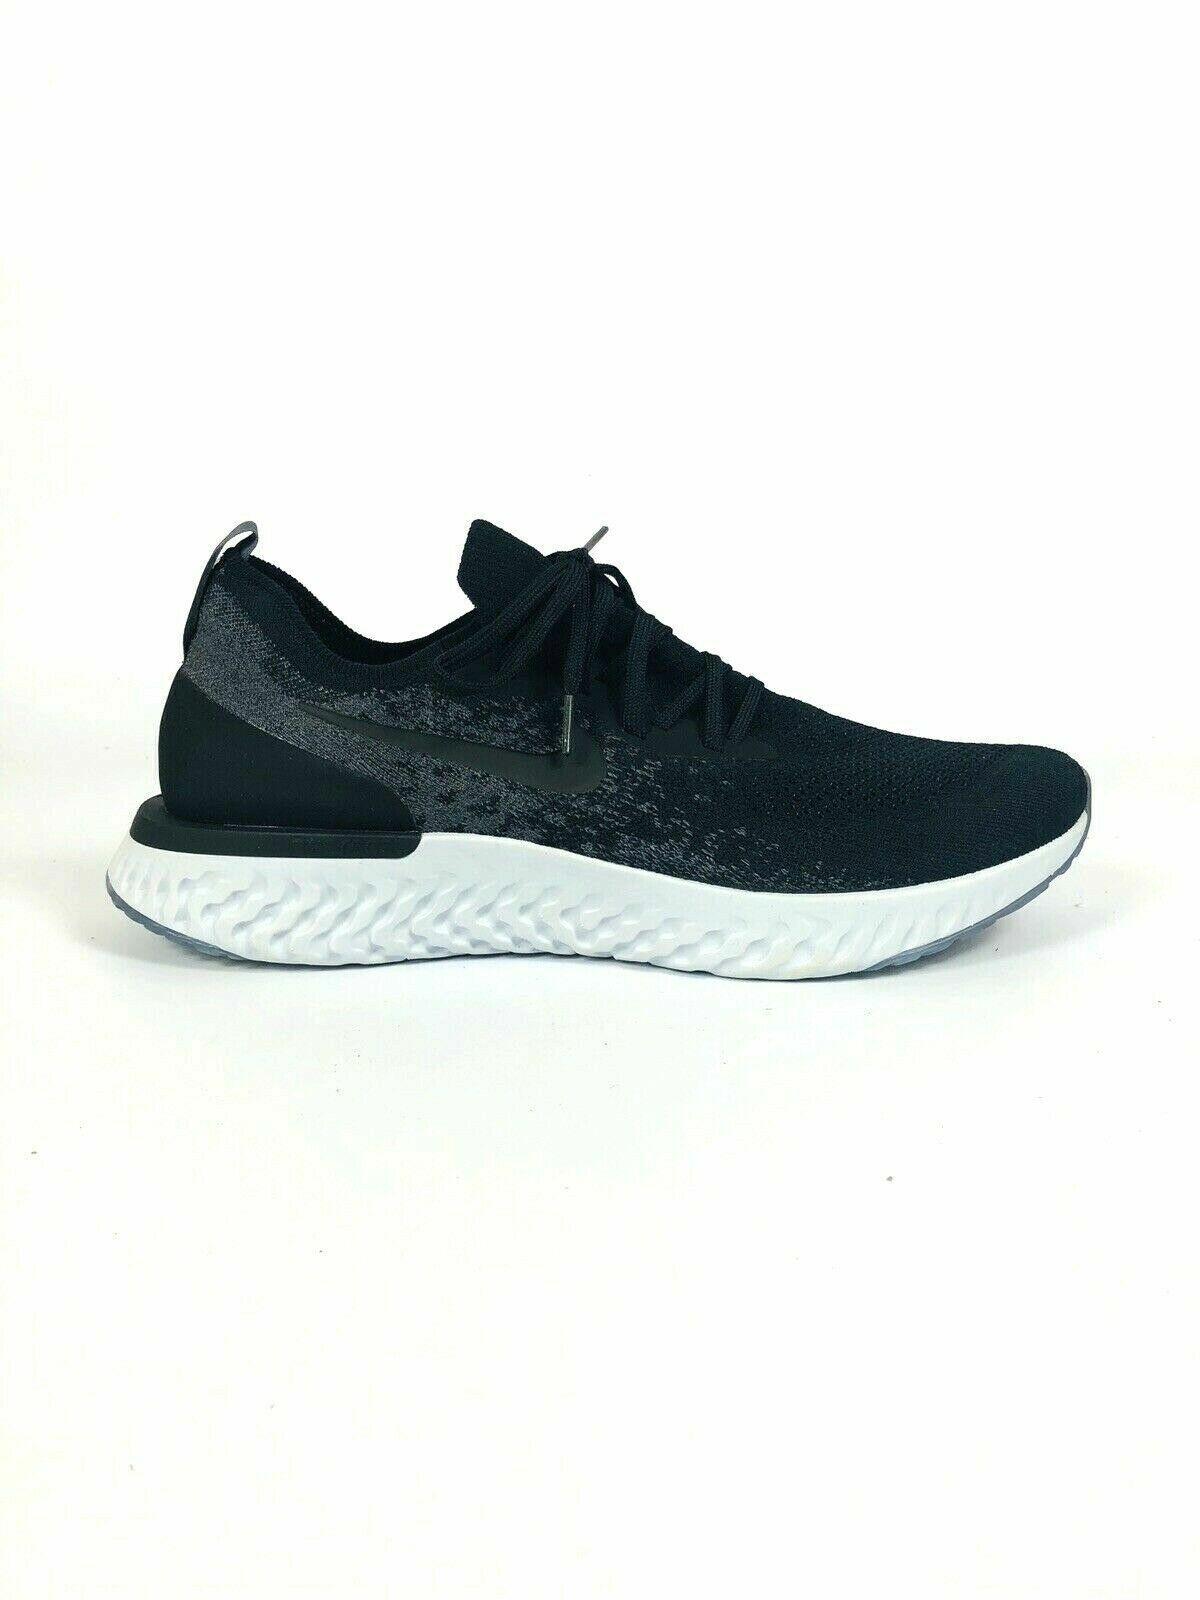 Nike Men Epic React Flyknit  Black Dark Grey'shoes Sneaker AQ0067 001 O32219  NEW